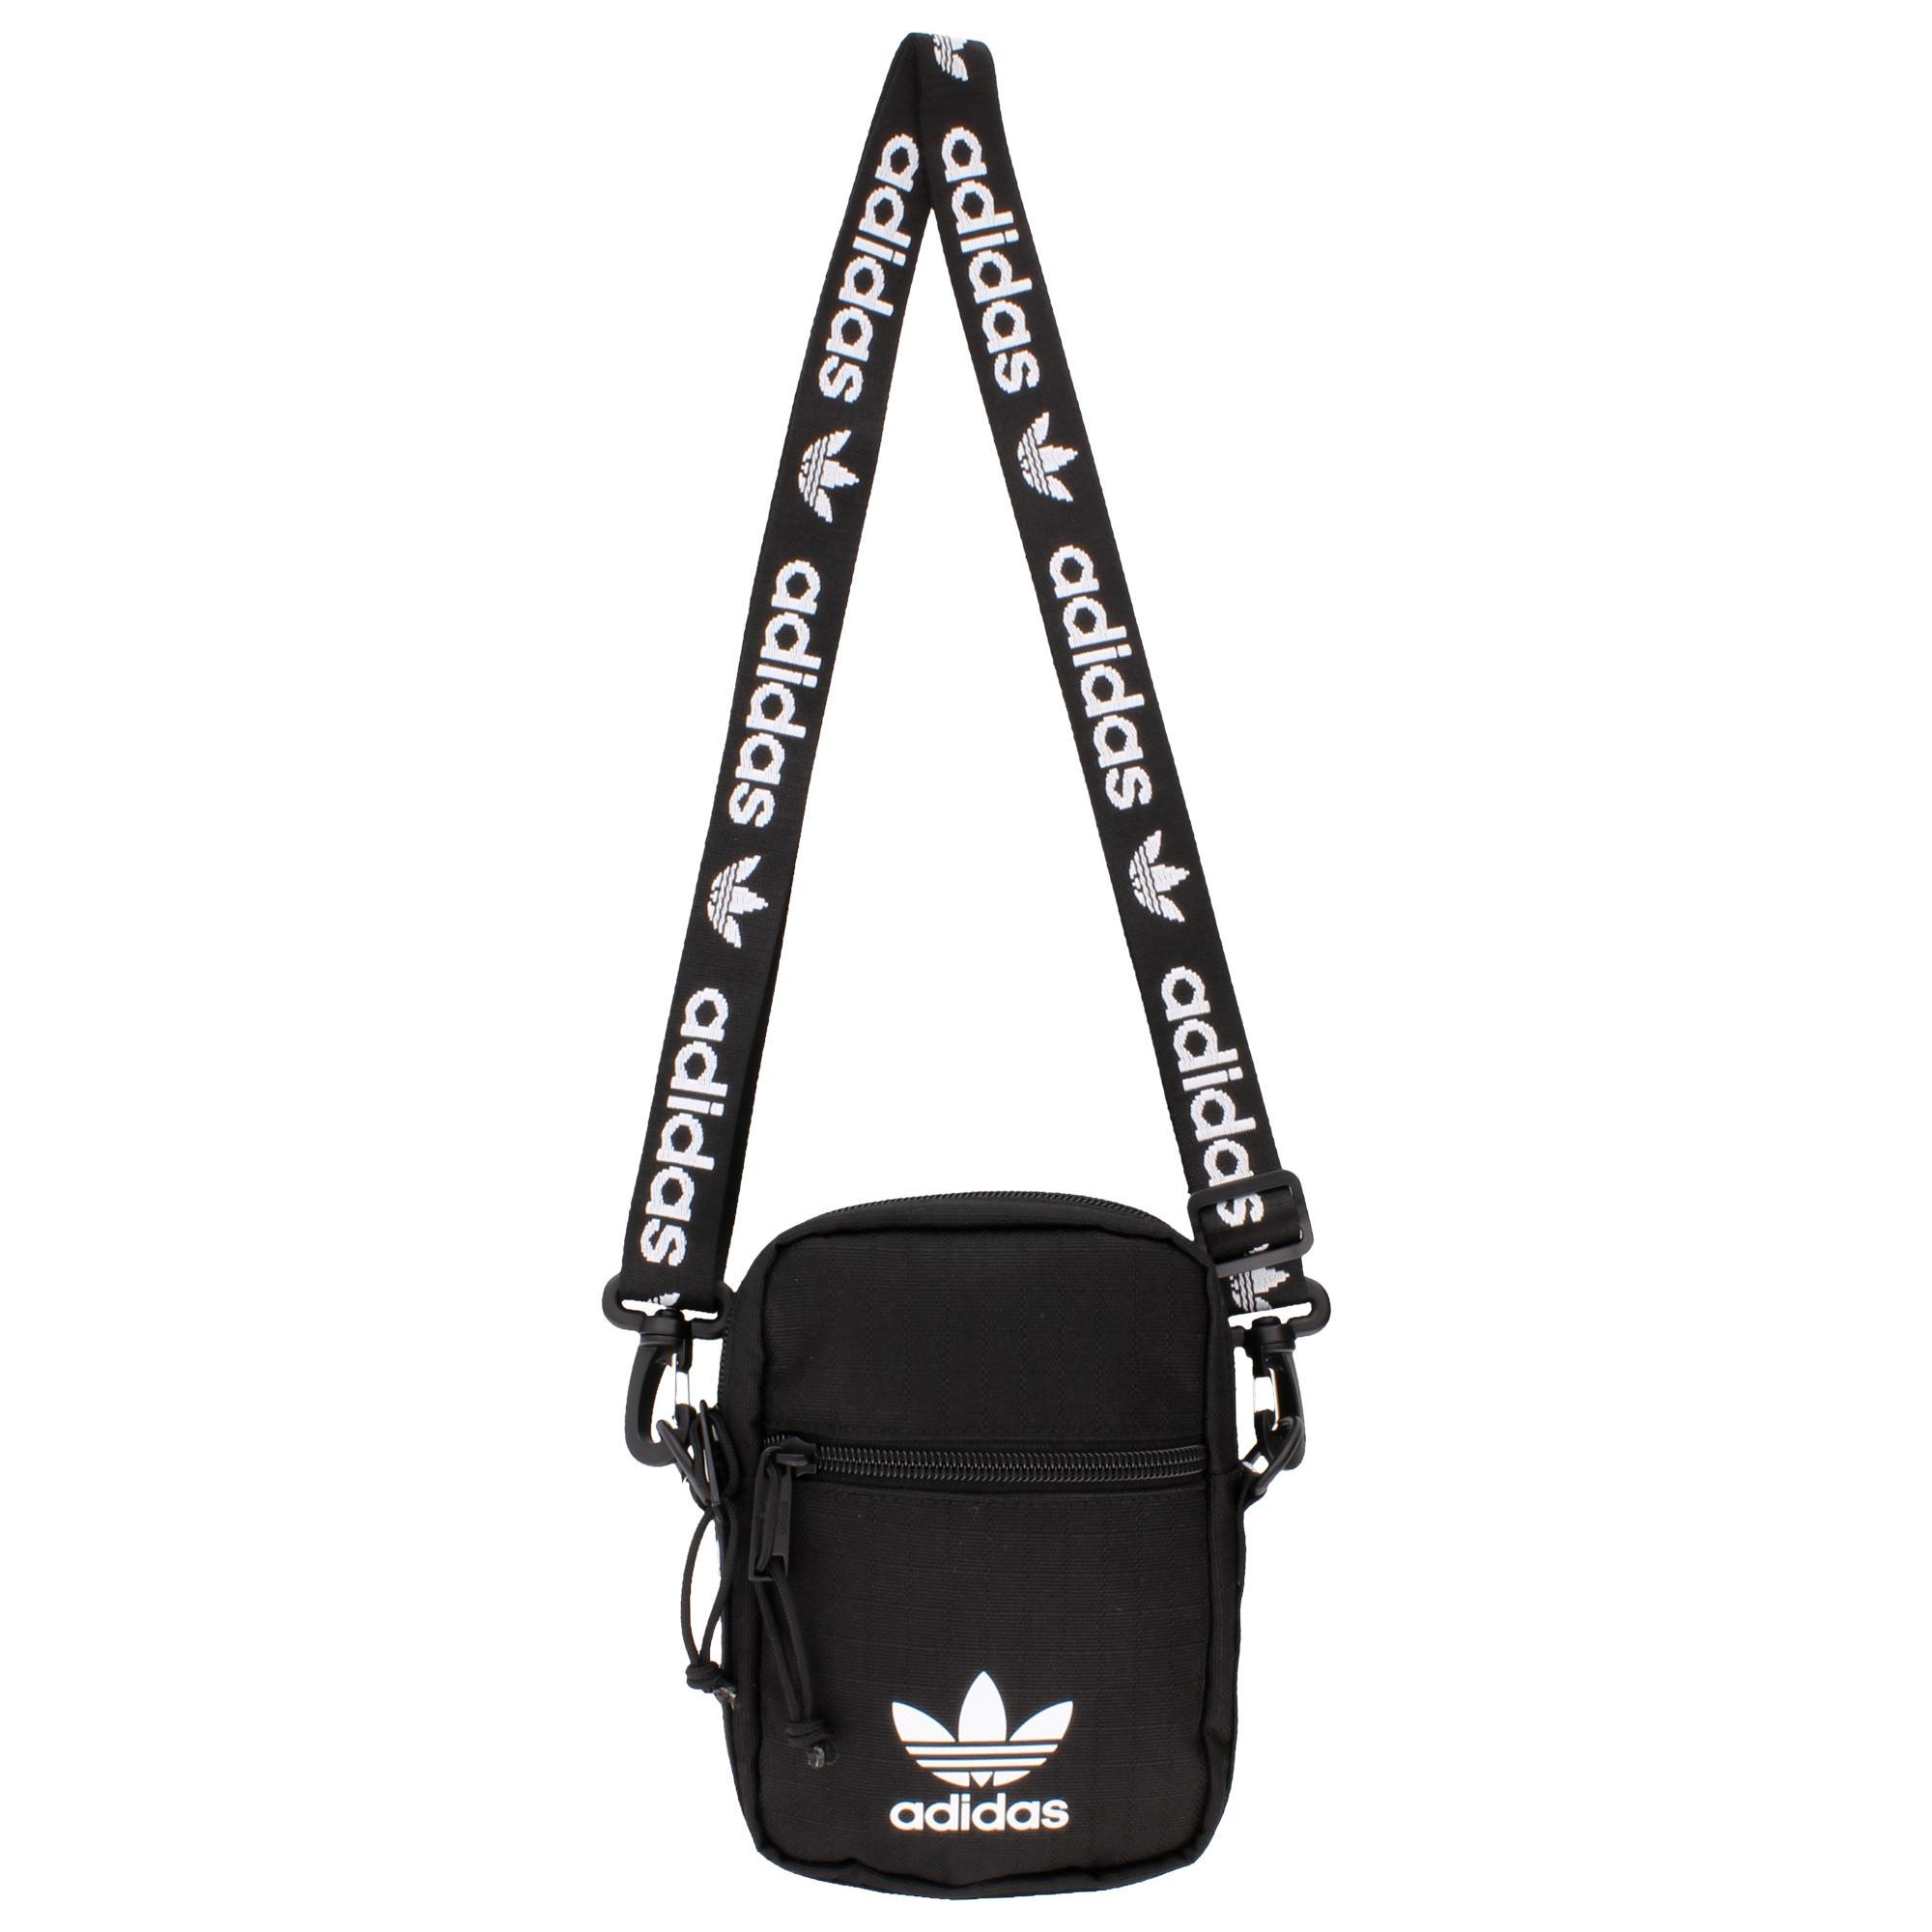 599494284850 Lyst - adidas Originals Shoulder Strap Festival Bag in Black